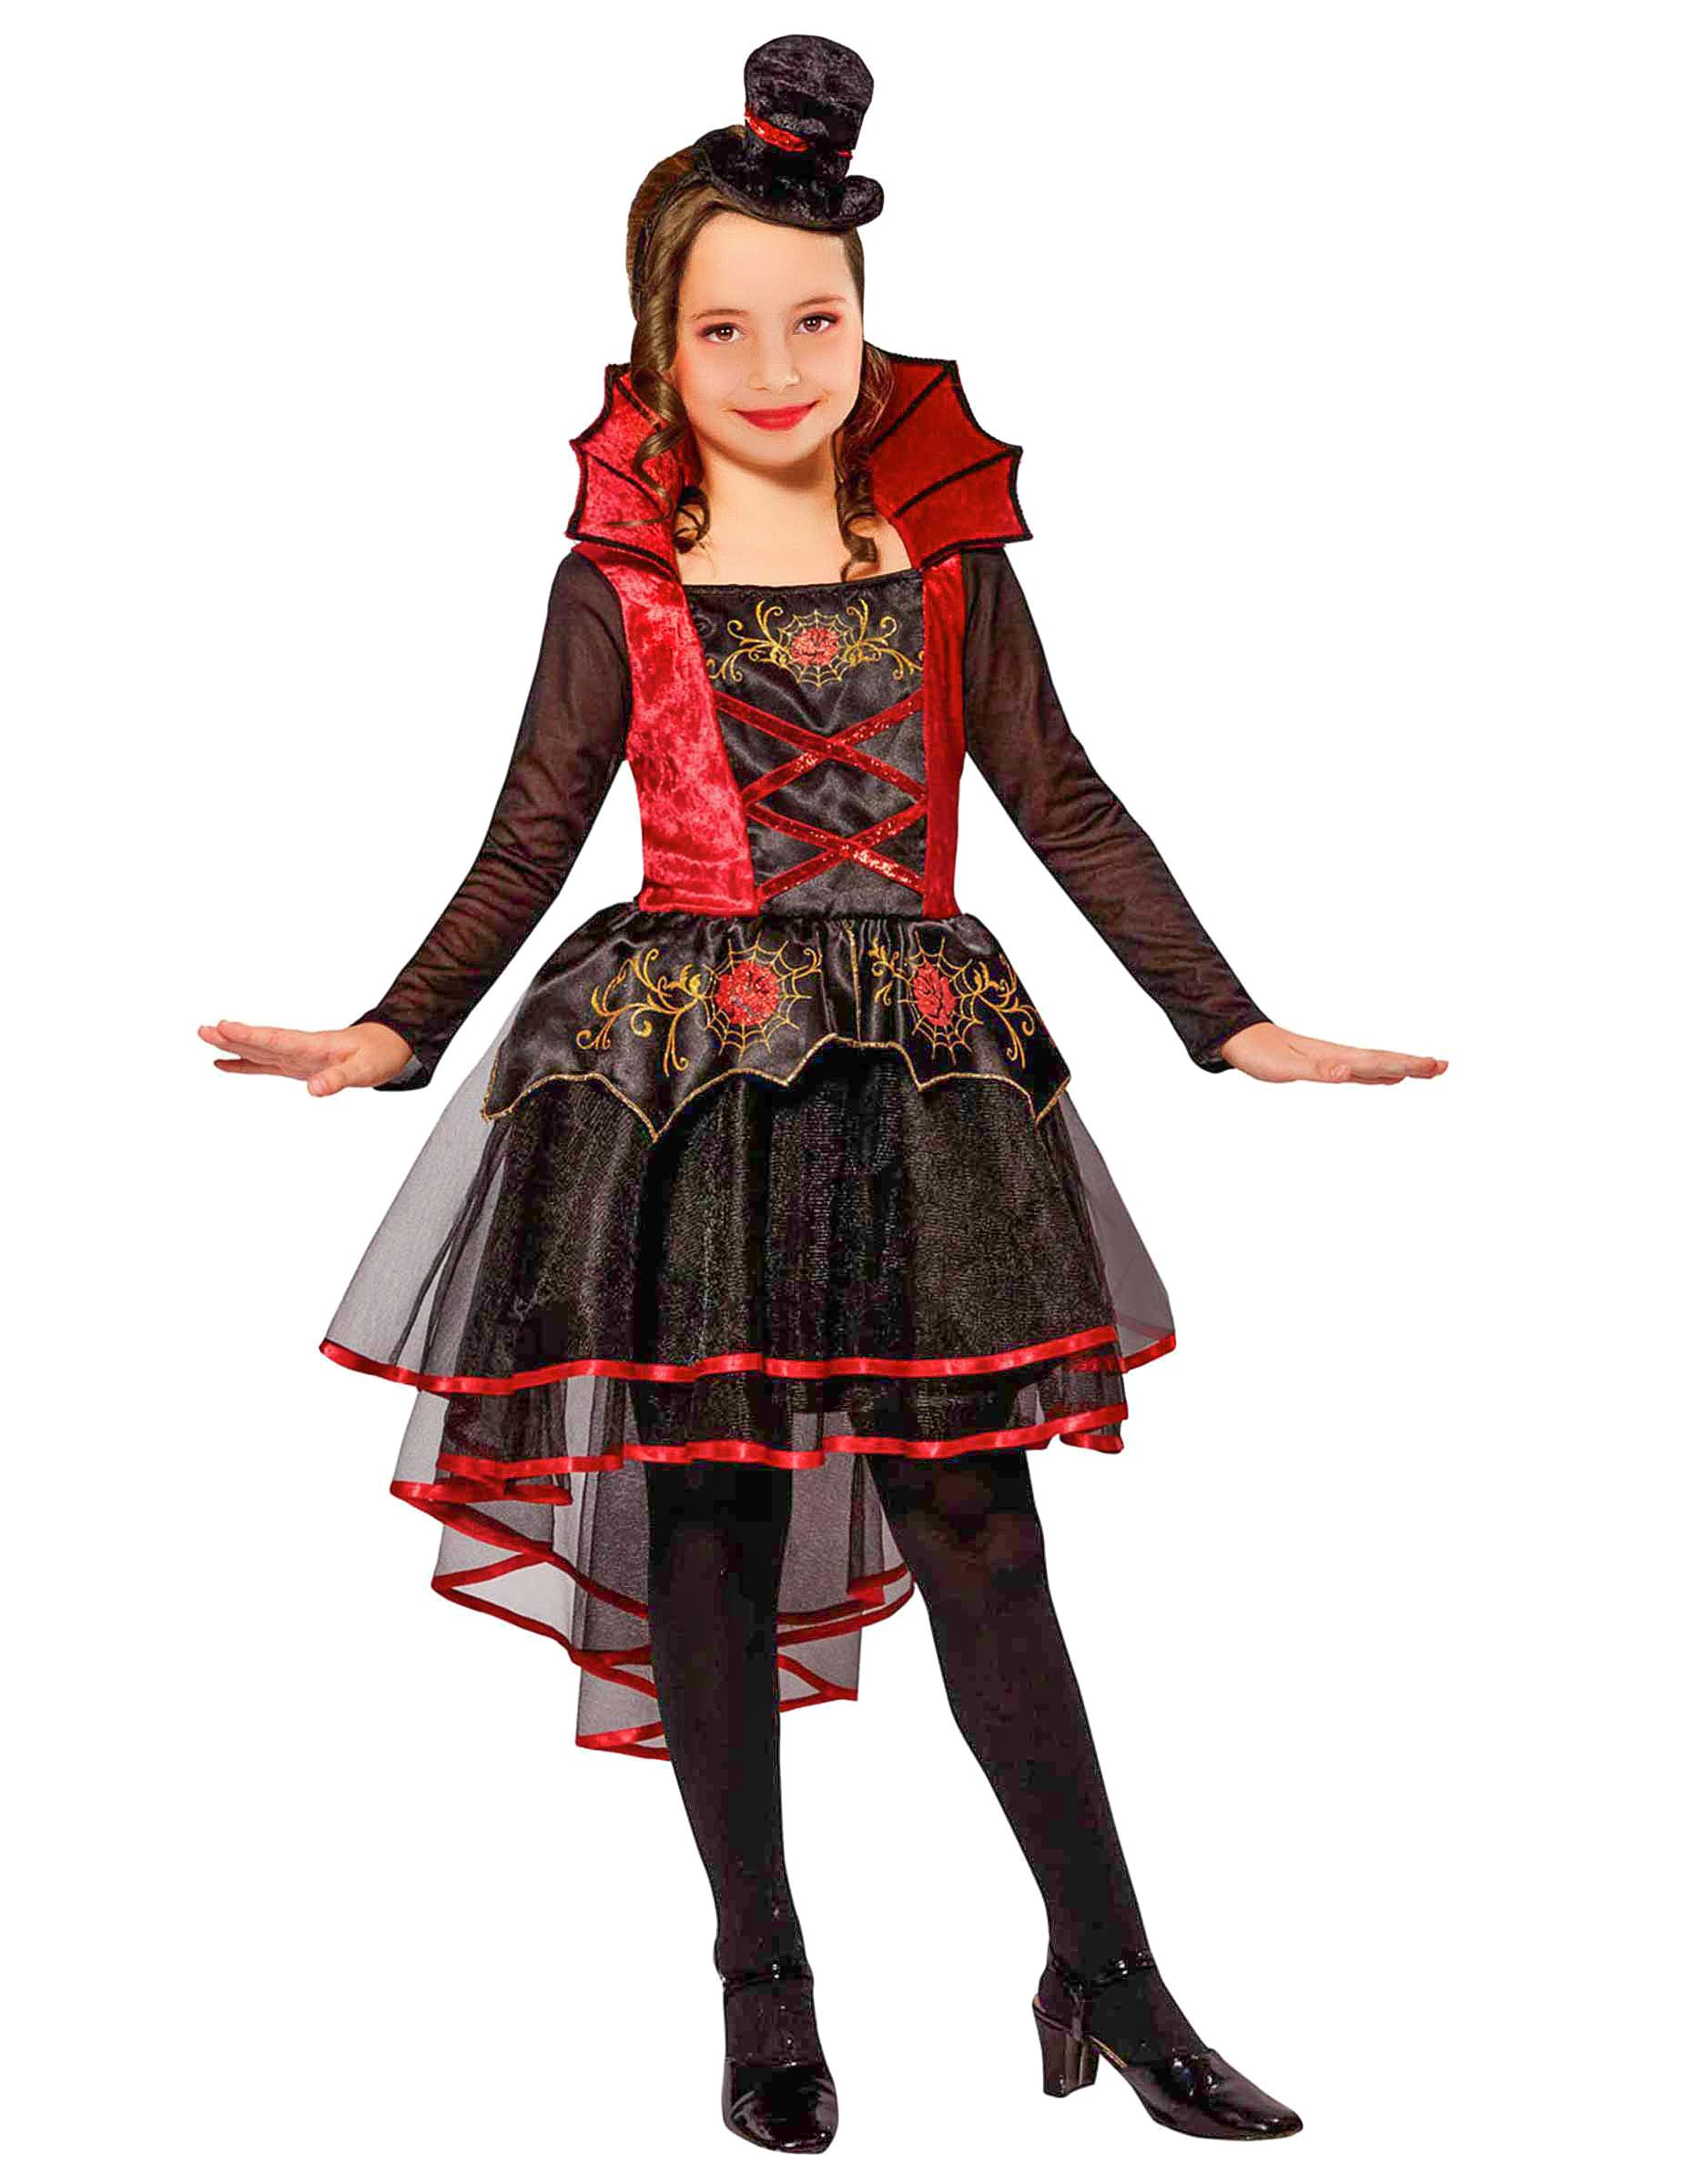 Costume da vampira vittoriana per bambina  Costumi bambini 75161098a8c1